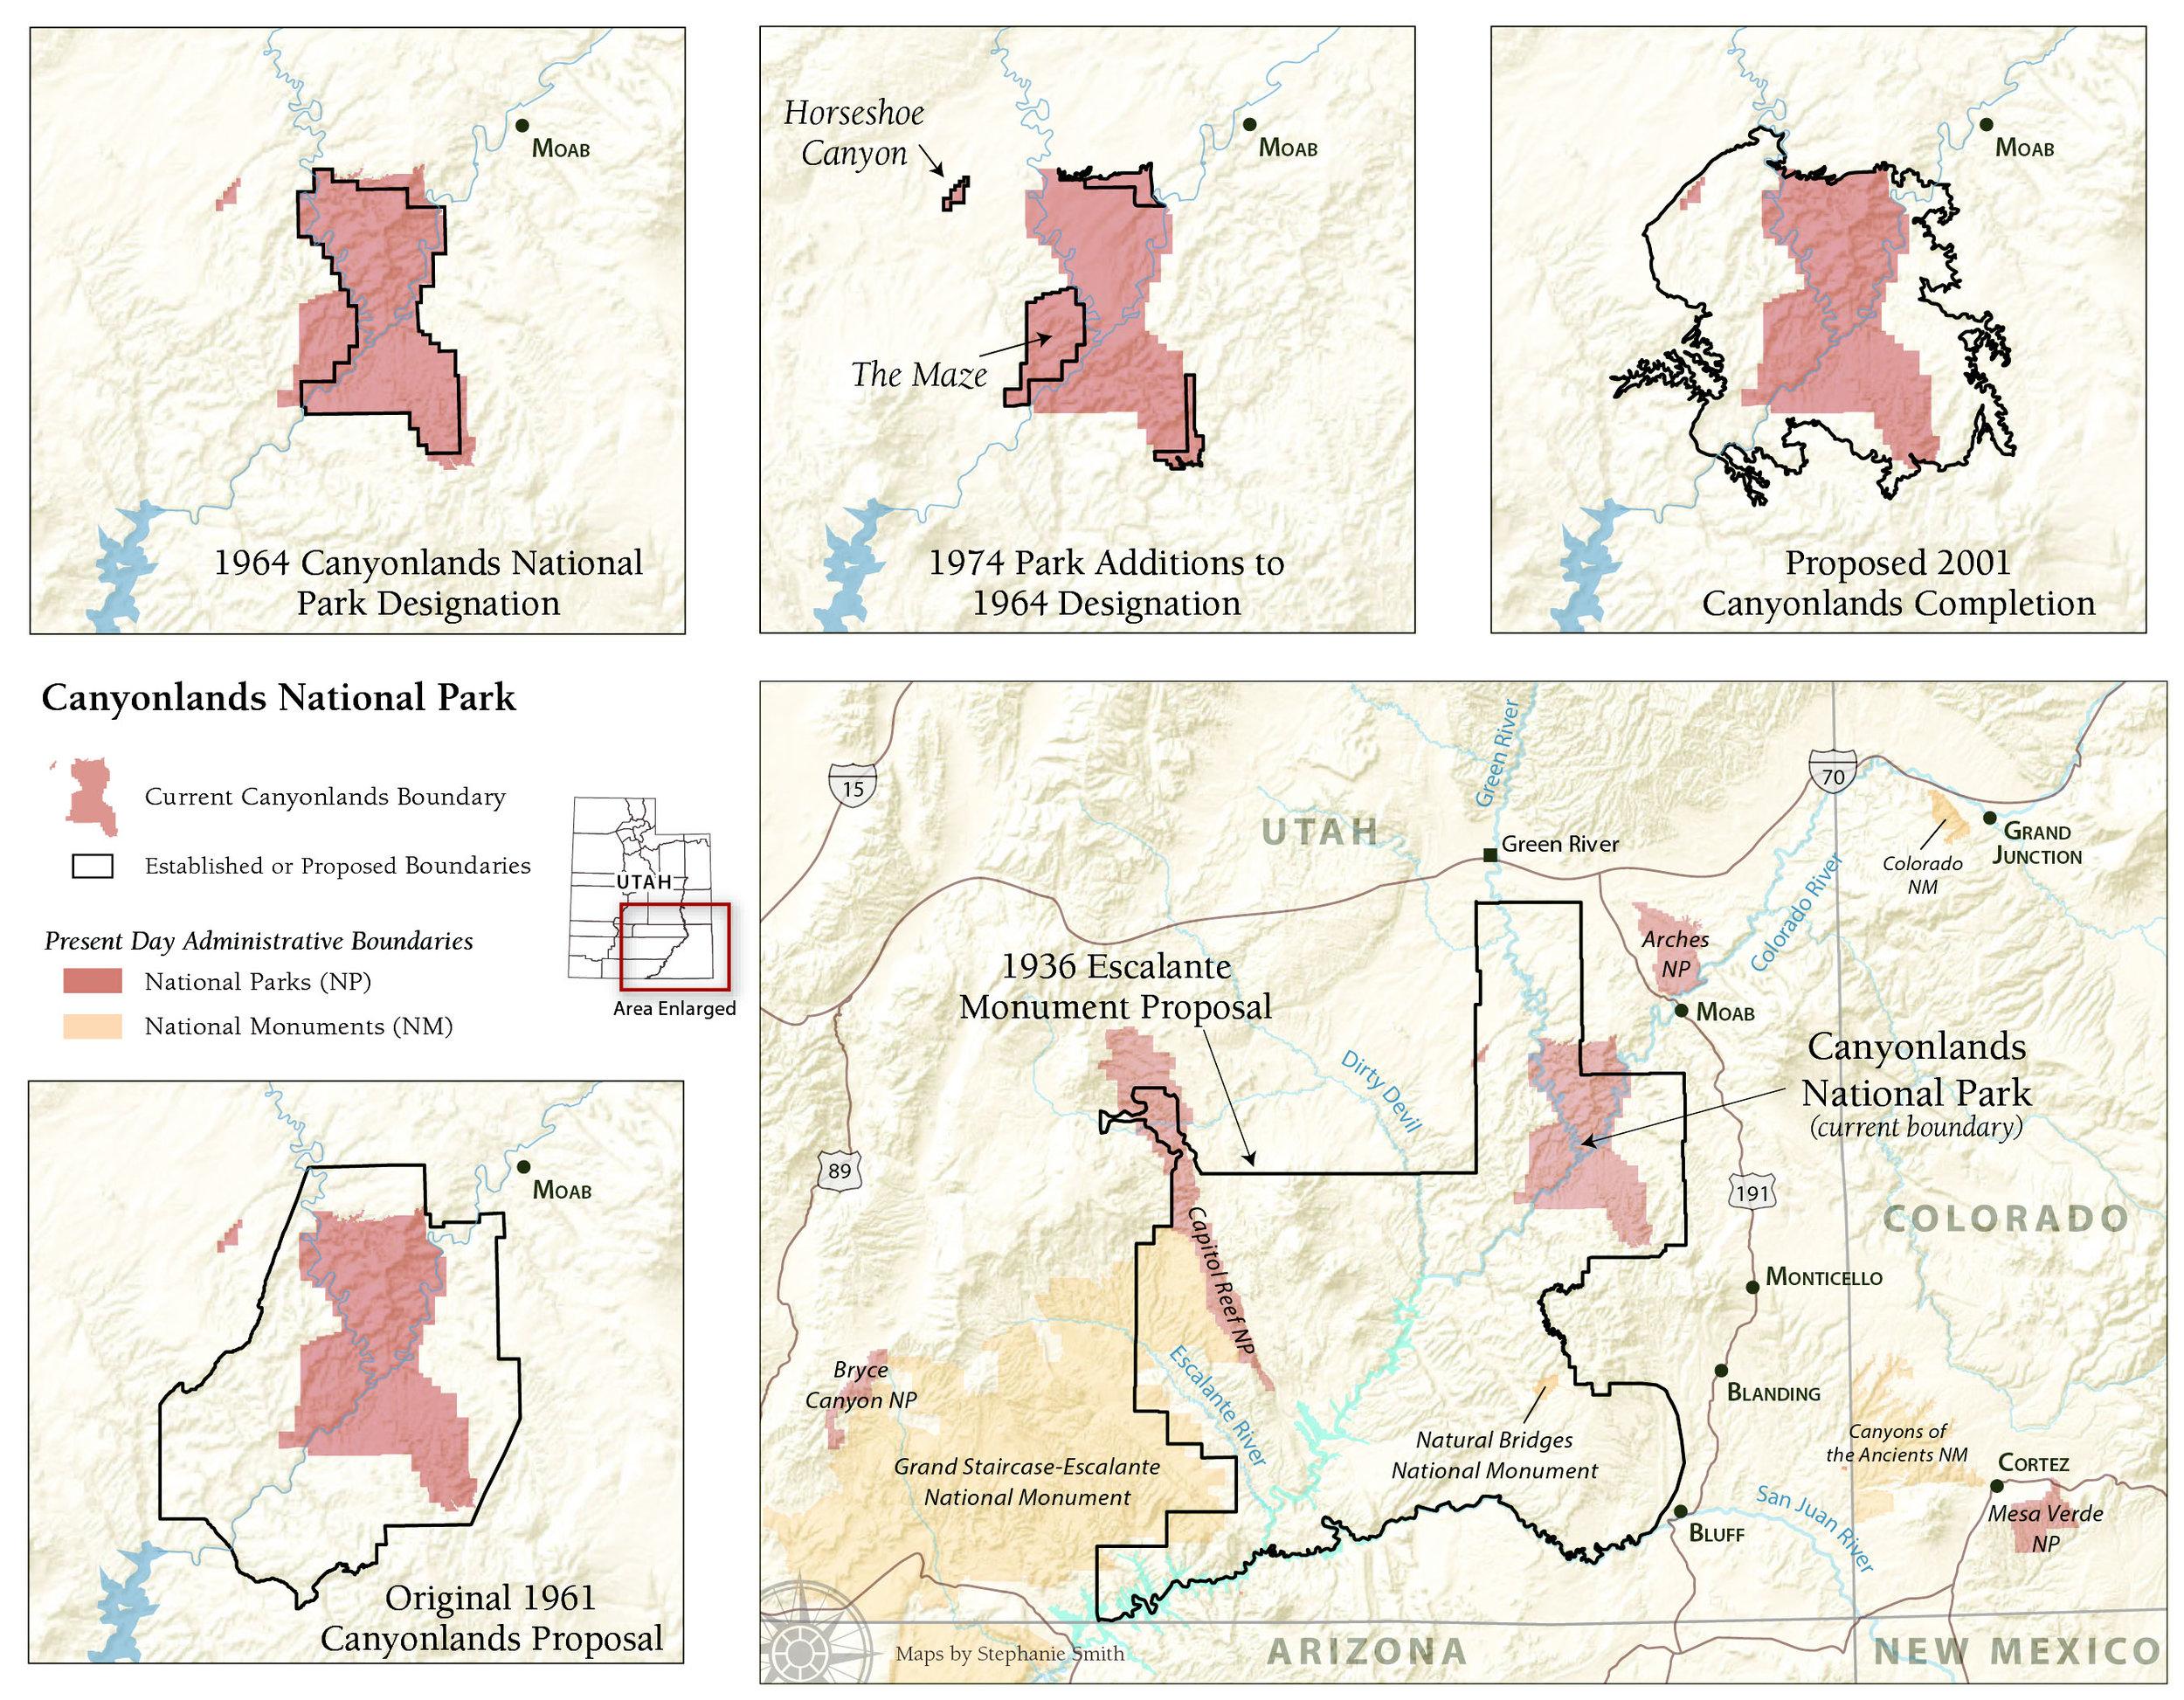 History of Canyonlands